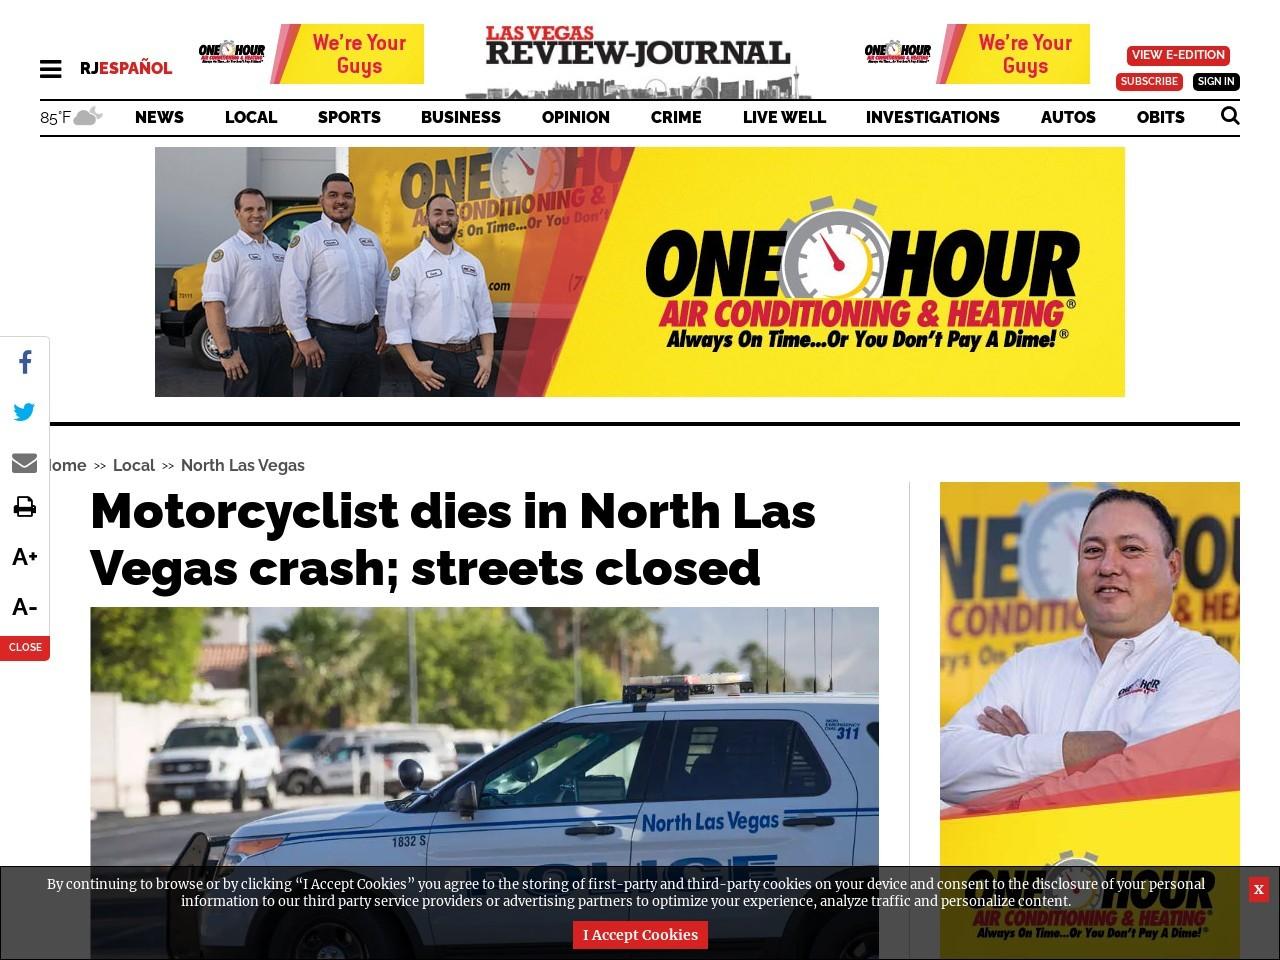 Motorcyclist dies in North Las Vegas crash; streets closed